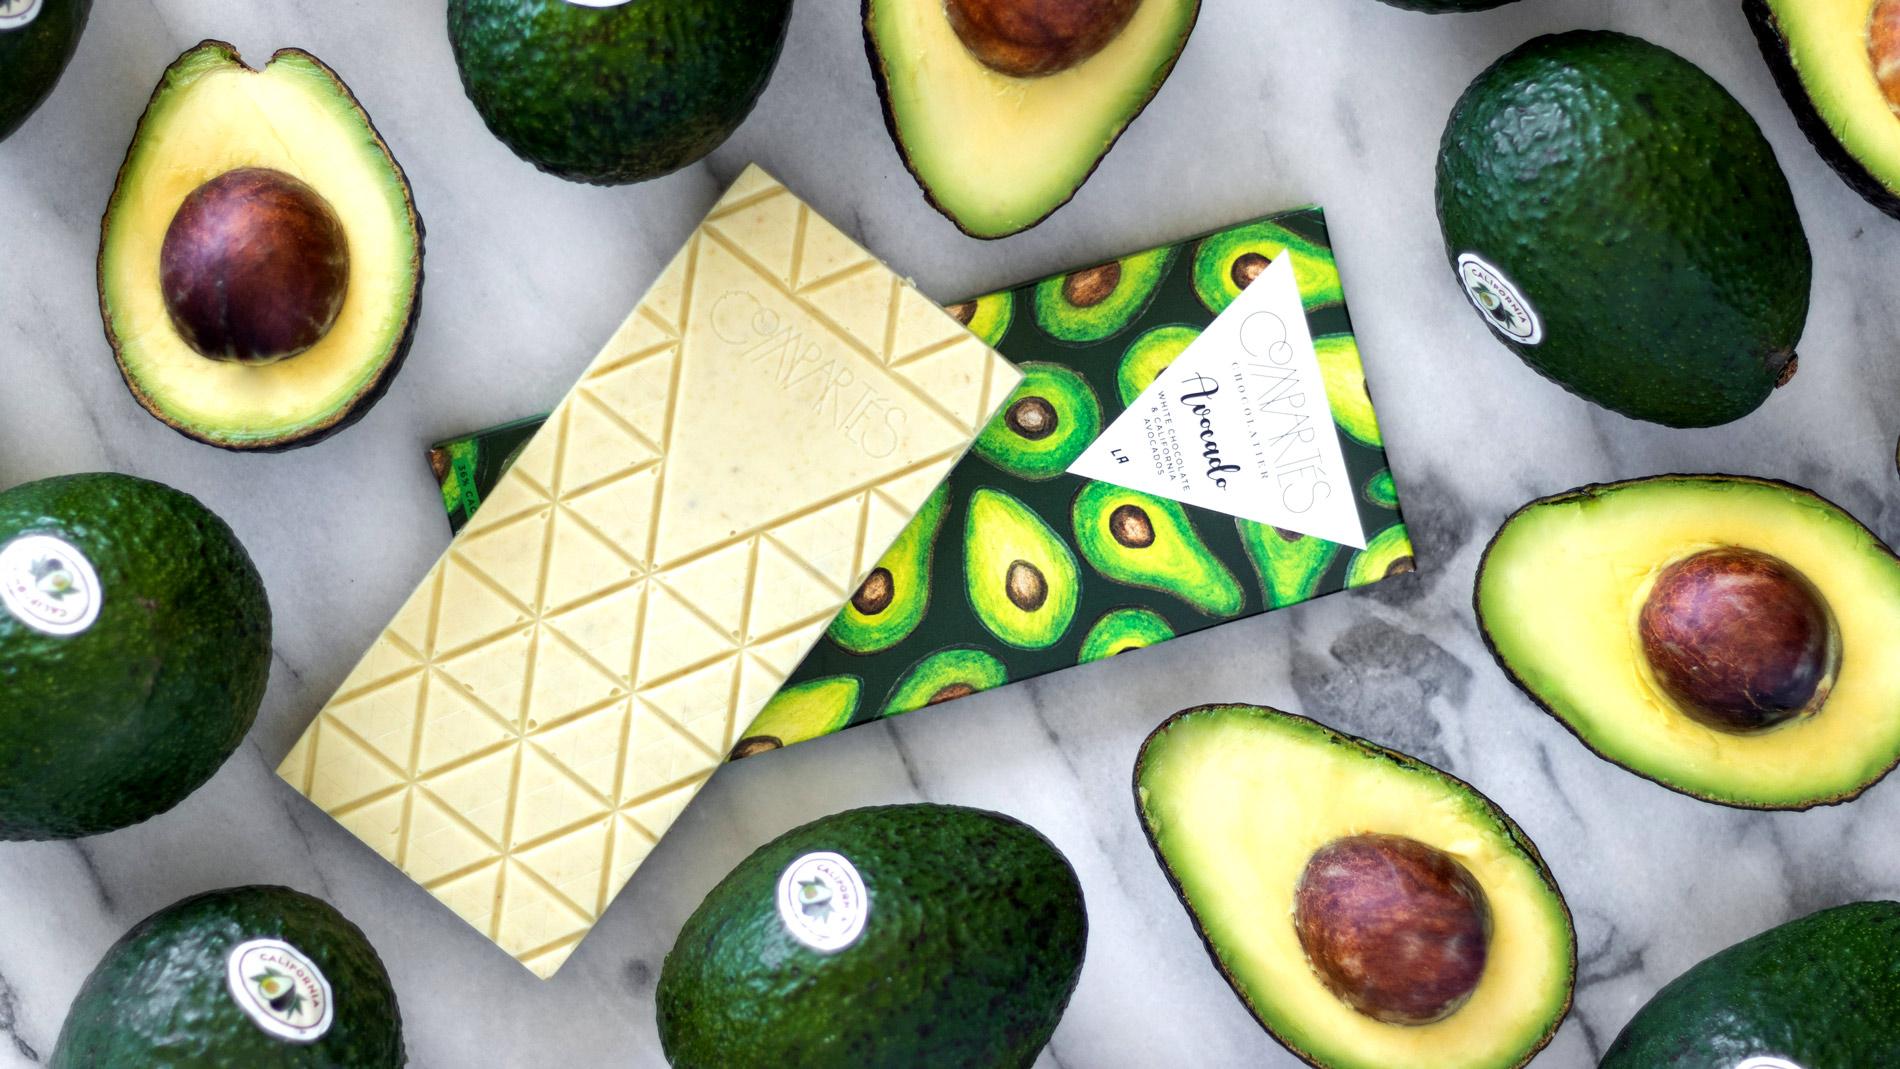 EC: Avocado Chocolate Bars Were Bound to Happen